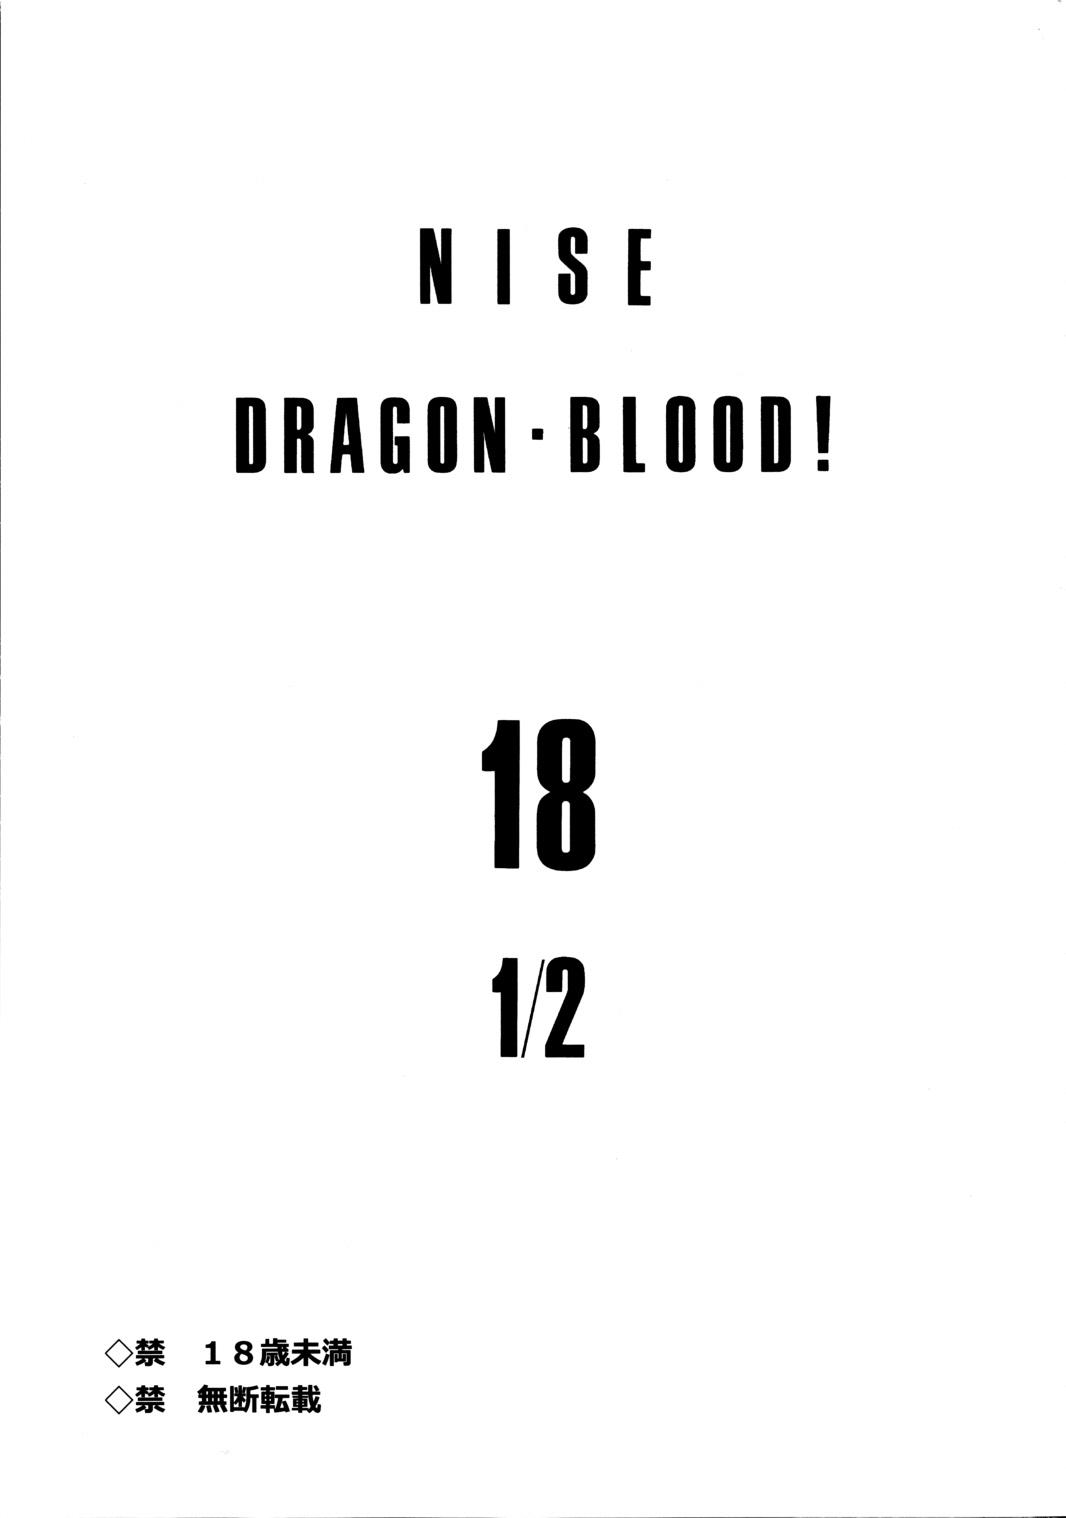 Nise DRAGON BLOOD! 18 1/2 2